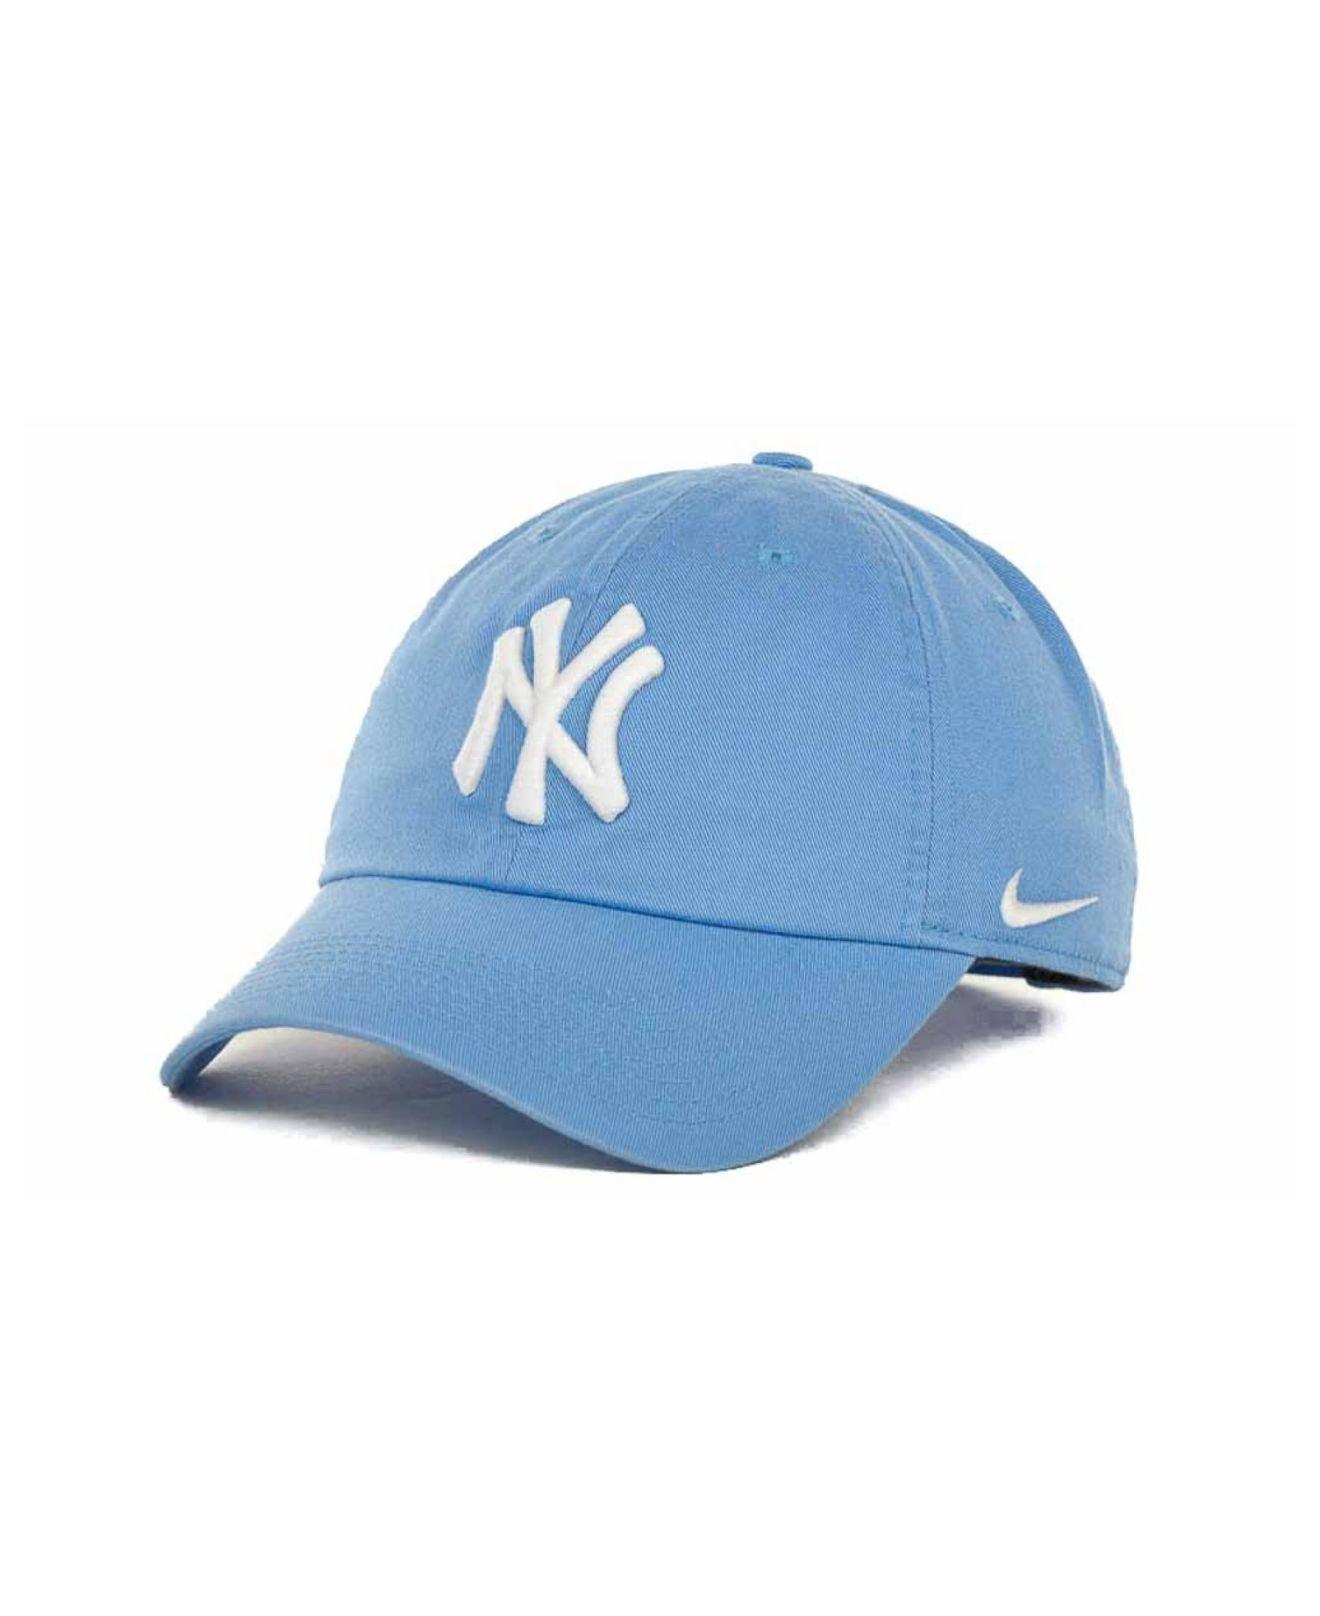 Lyst - Nike Women s New York Yankees Stadium Cap in Blue 0fe9acca9